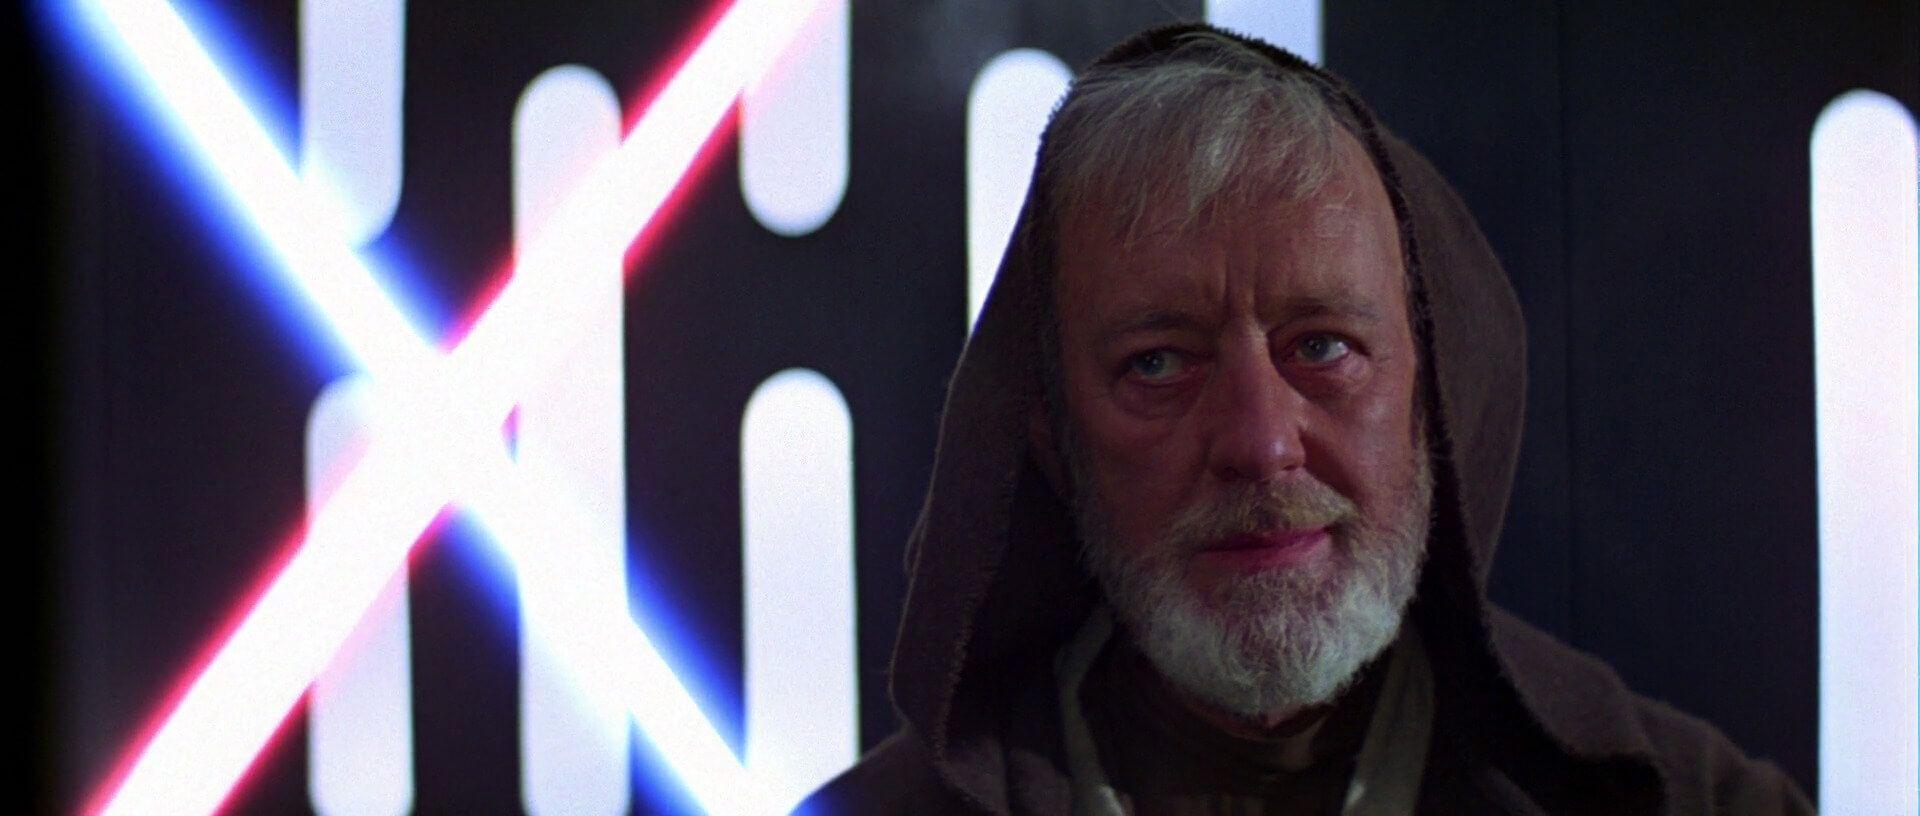 Star Wars Pattern Doesn't Bode Well for Cere in Jedi: Fallen Order 2